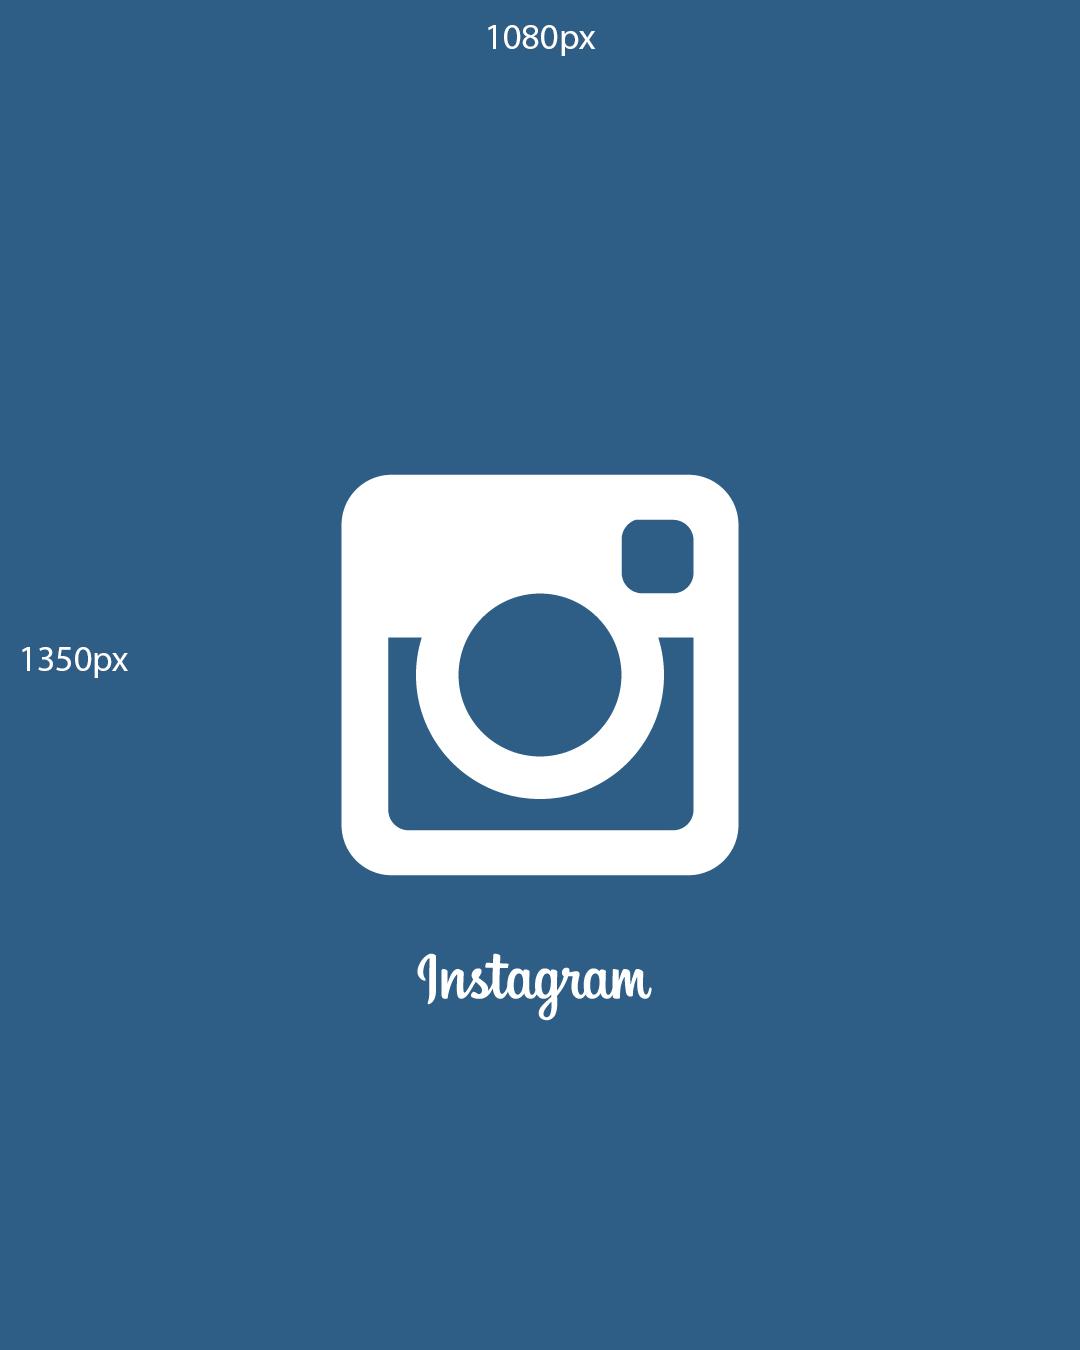 instagram-image-size-vertical-new